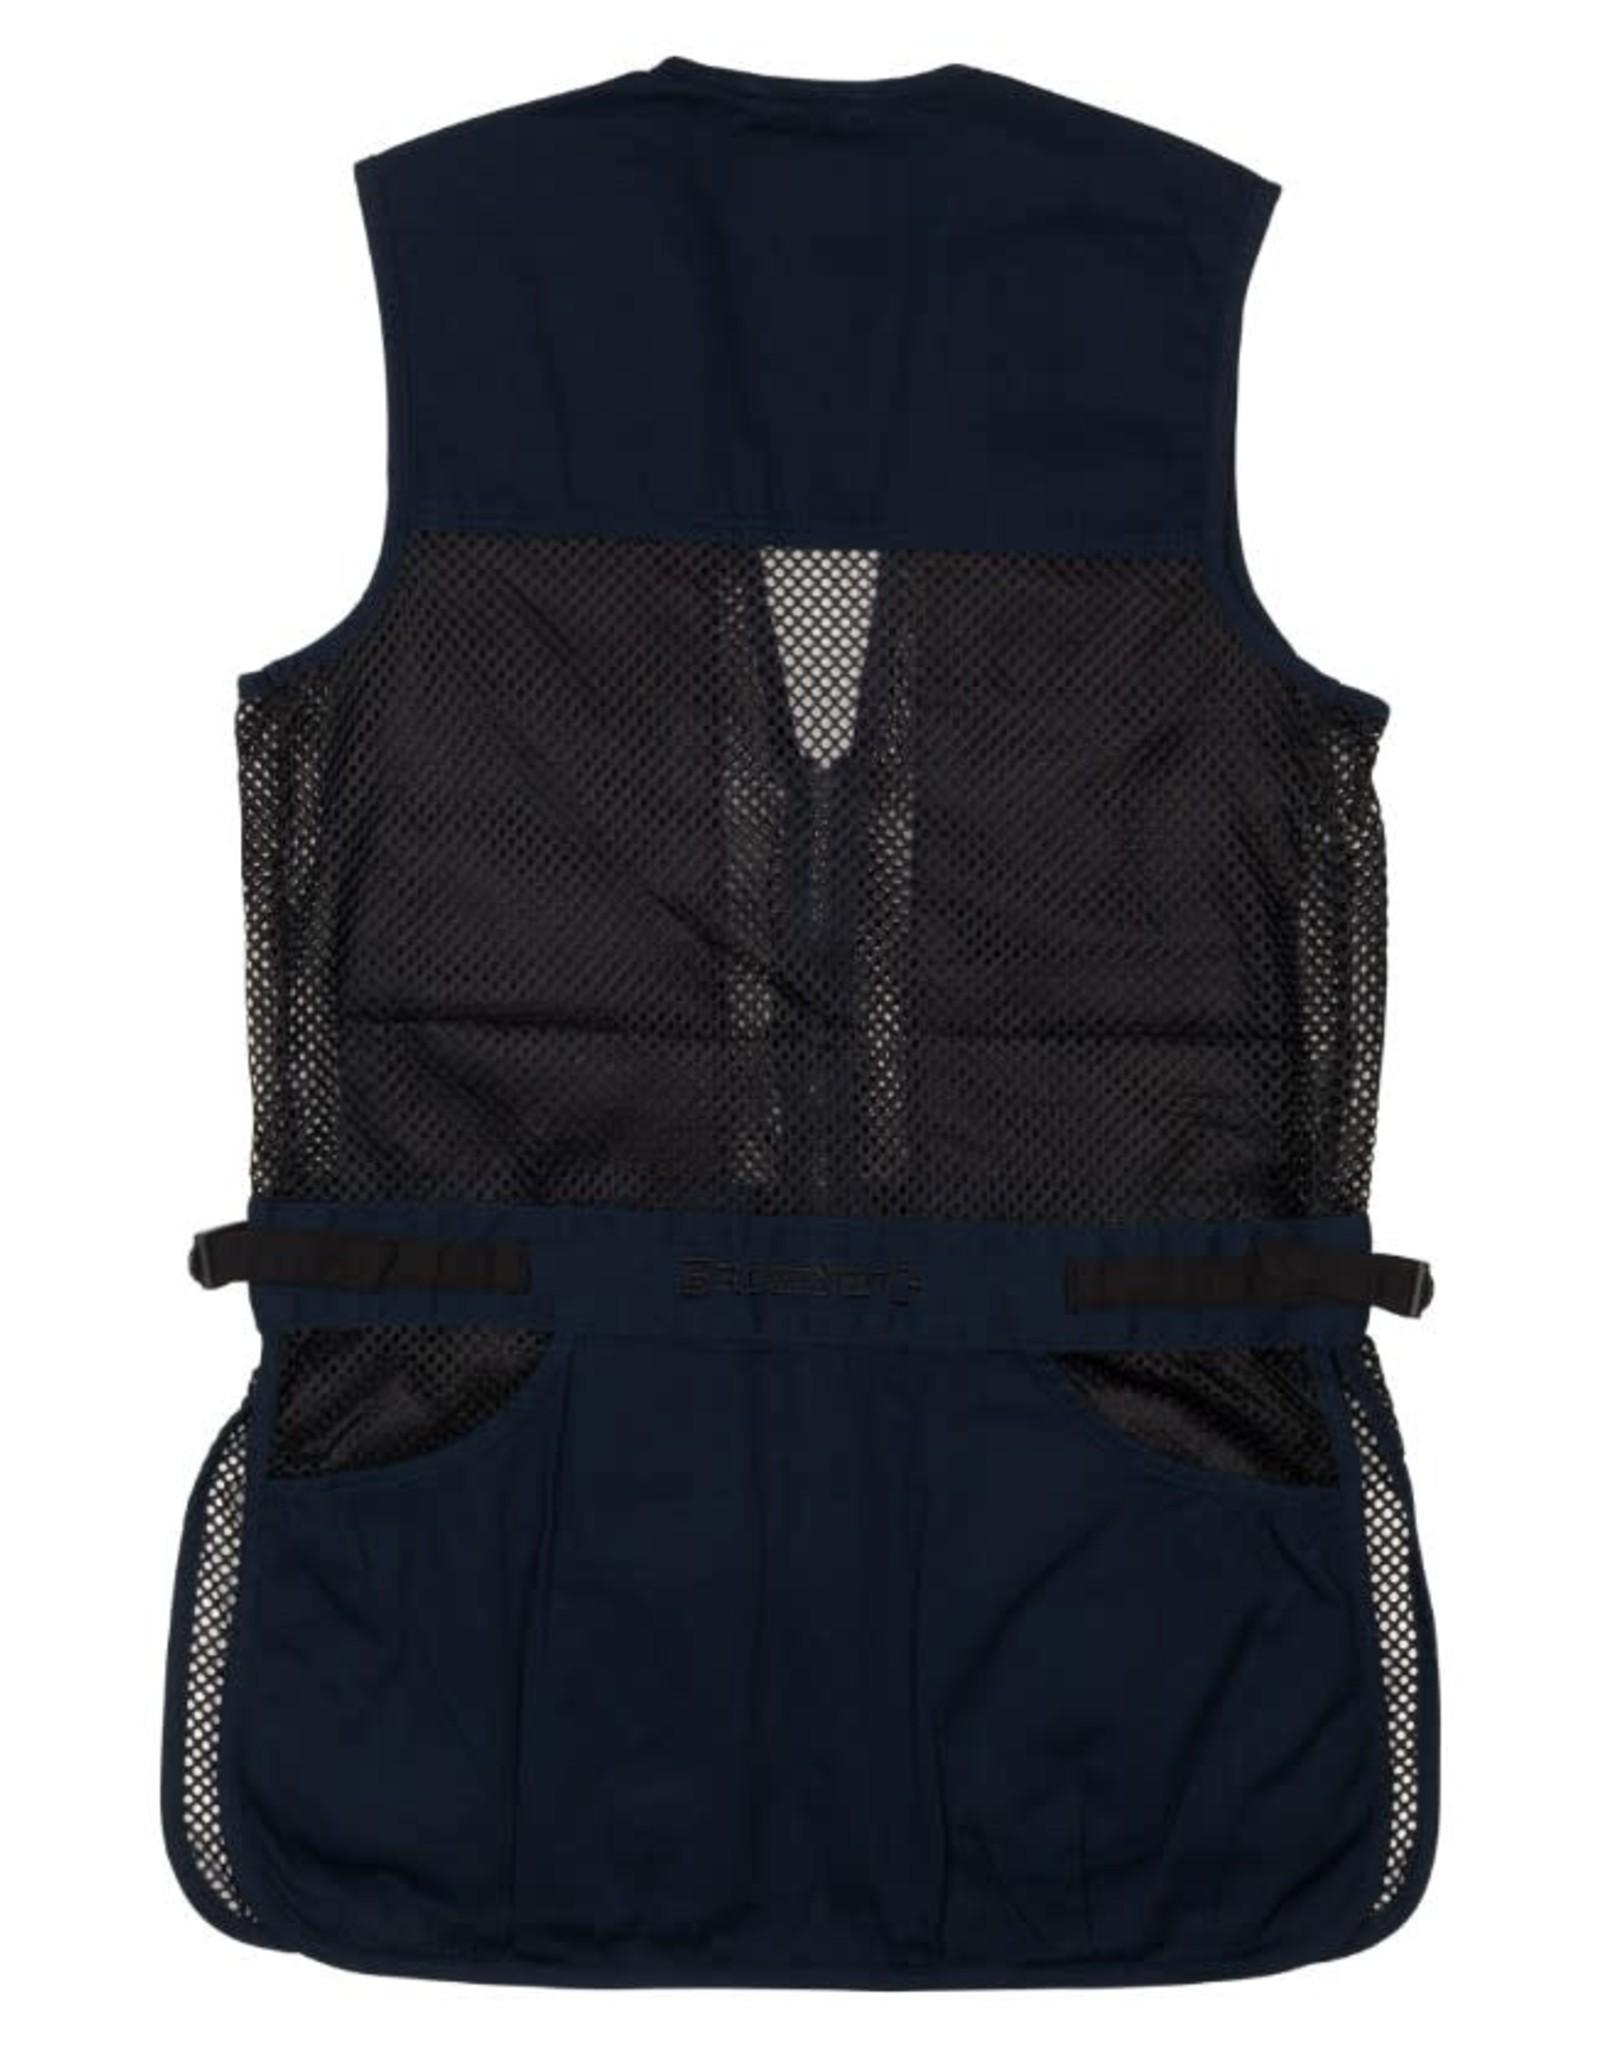 Browning Trapper Creek Junior Vest - Blk/Navy - MED